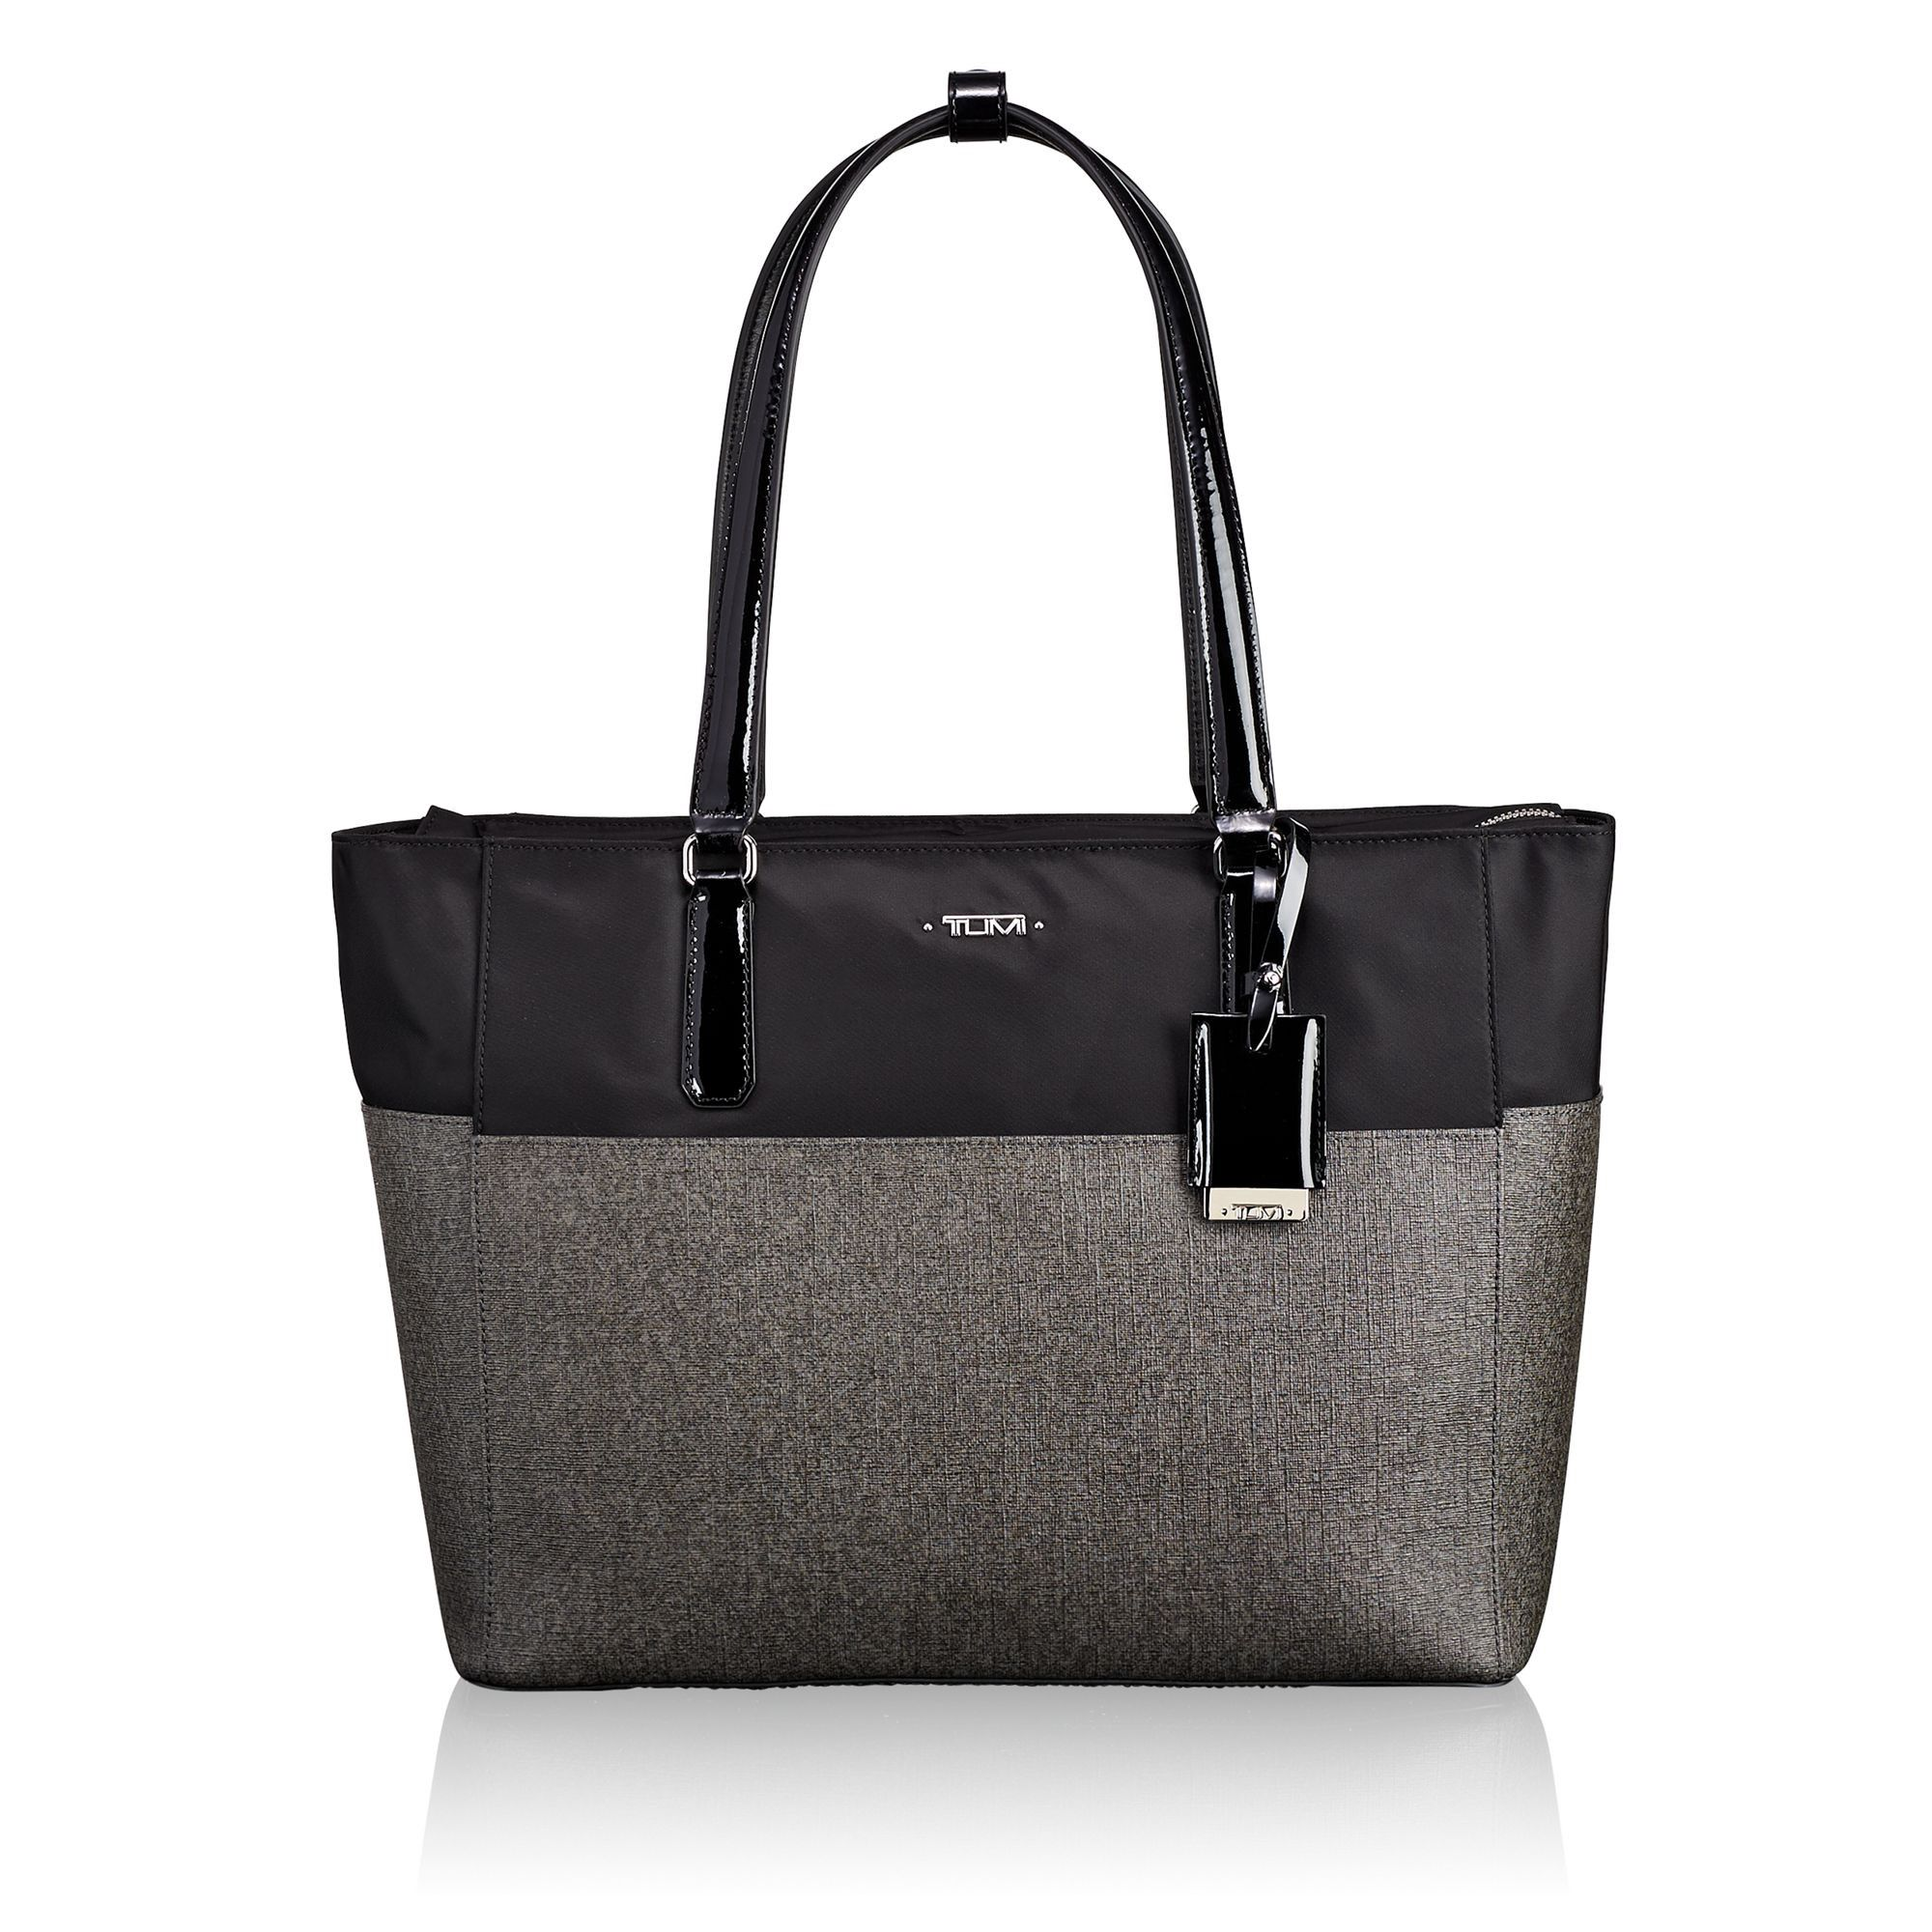 e7ef395971 TUMI Carolina Tote - Earl Grey Black.  tumi  bags  canvas  tote  leather   shoulder bags  hand bags  nylon